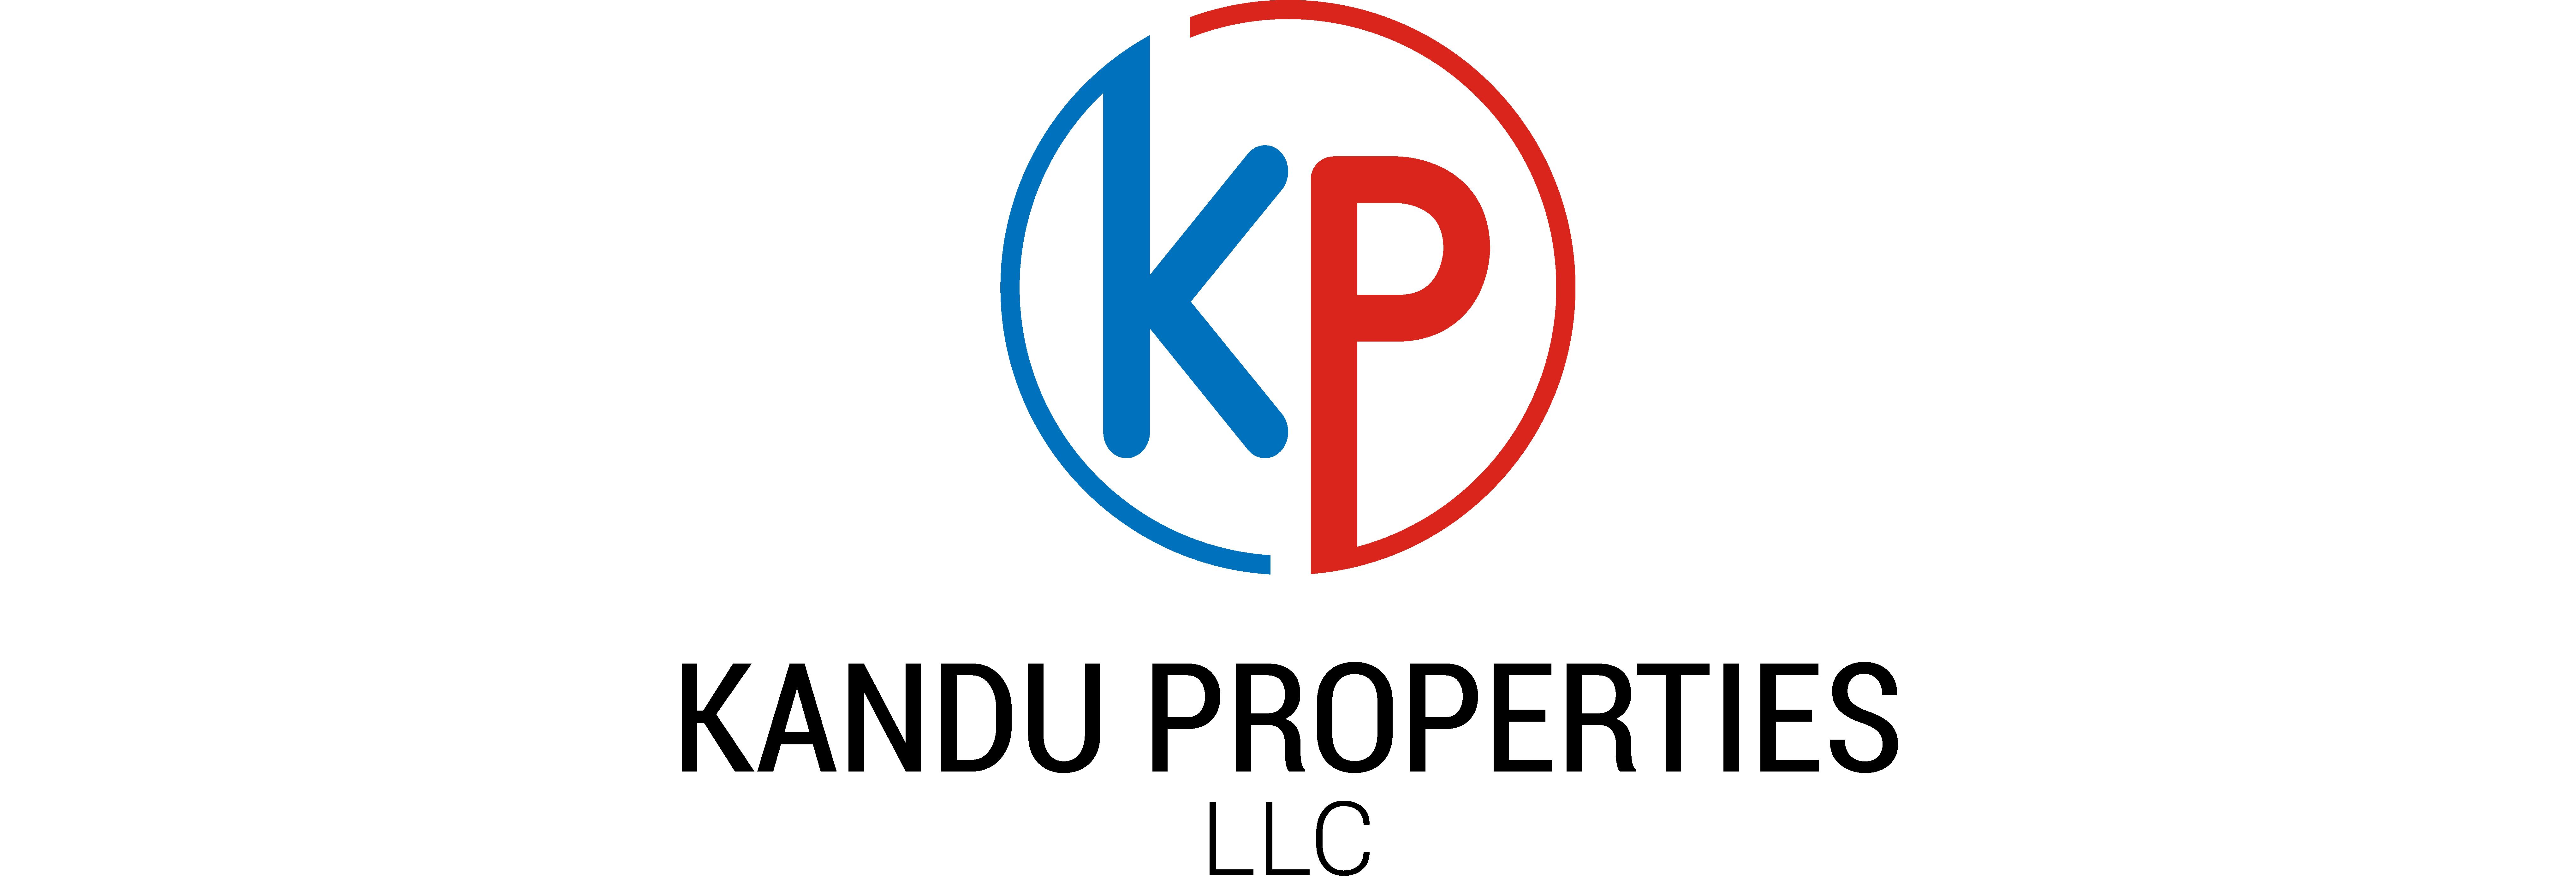 Kandu Properties, LLC